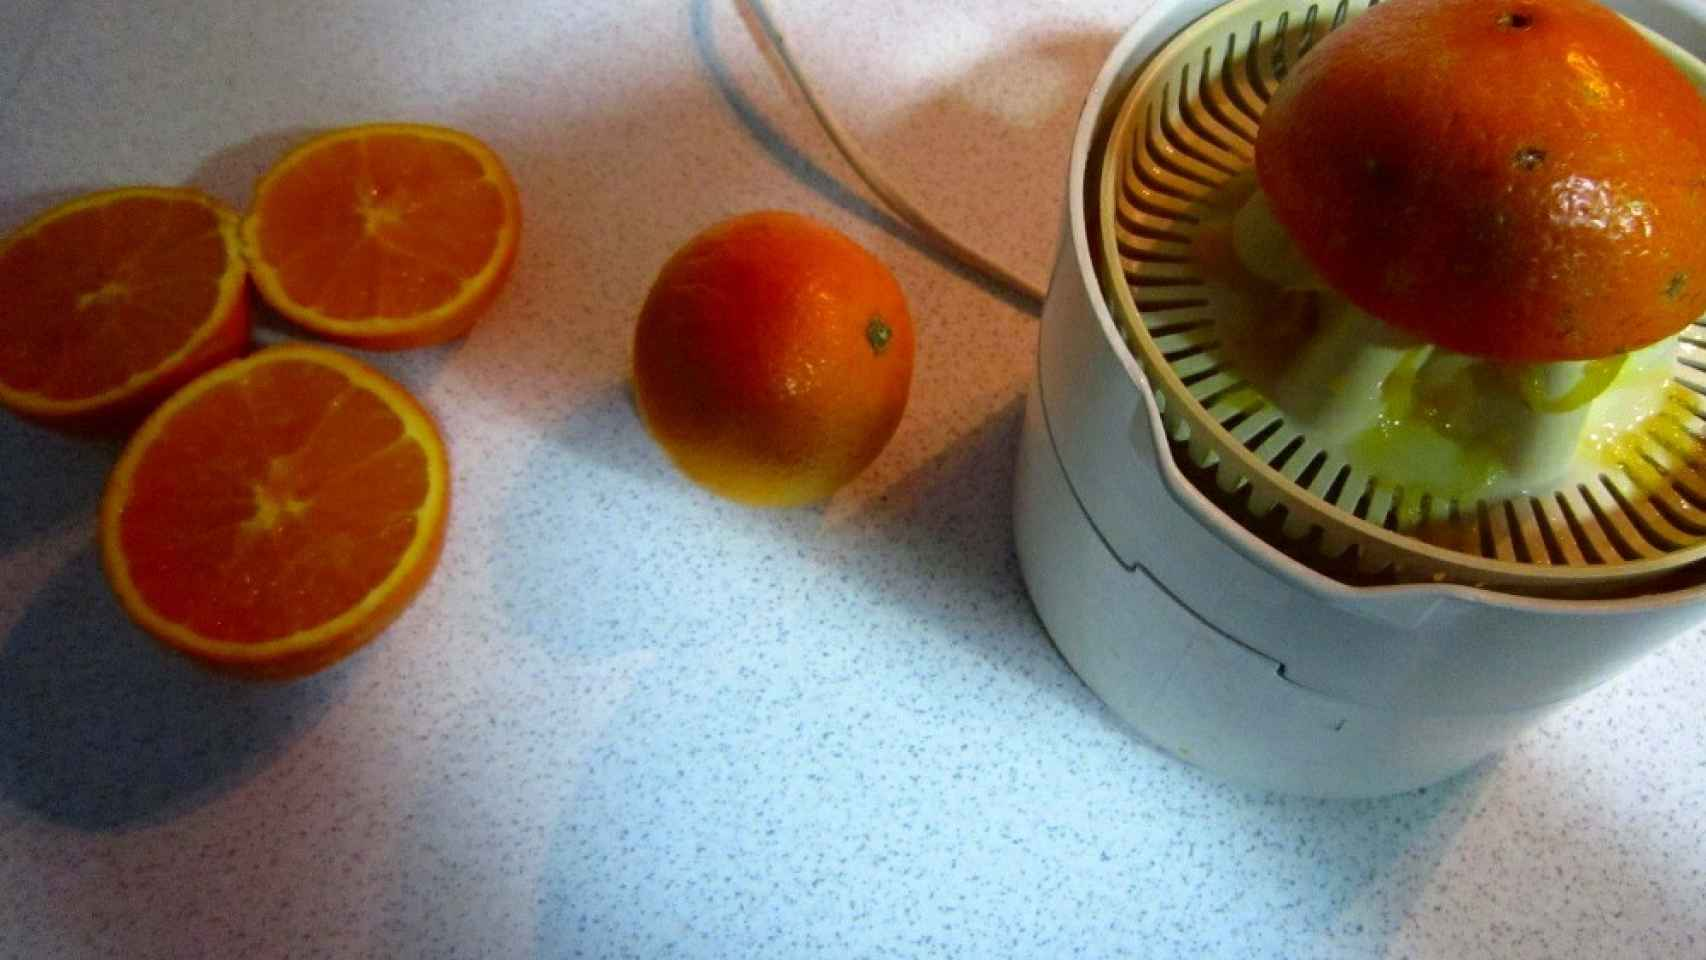 Rape a la naranja - Haciendo zumo